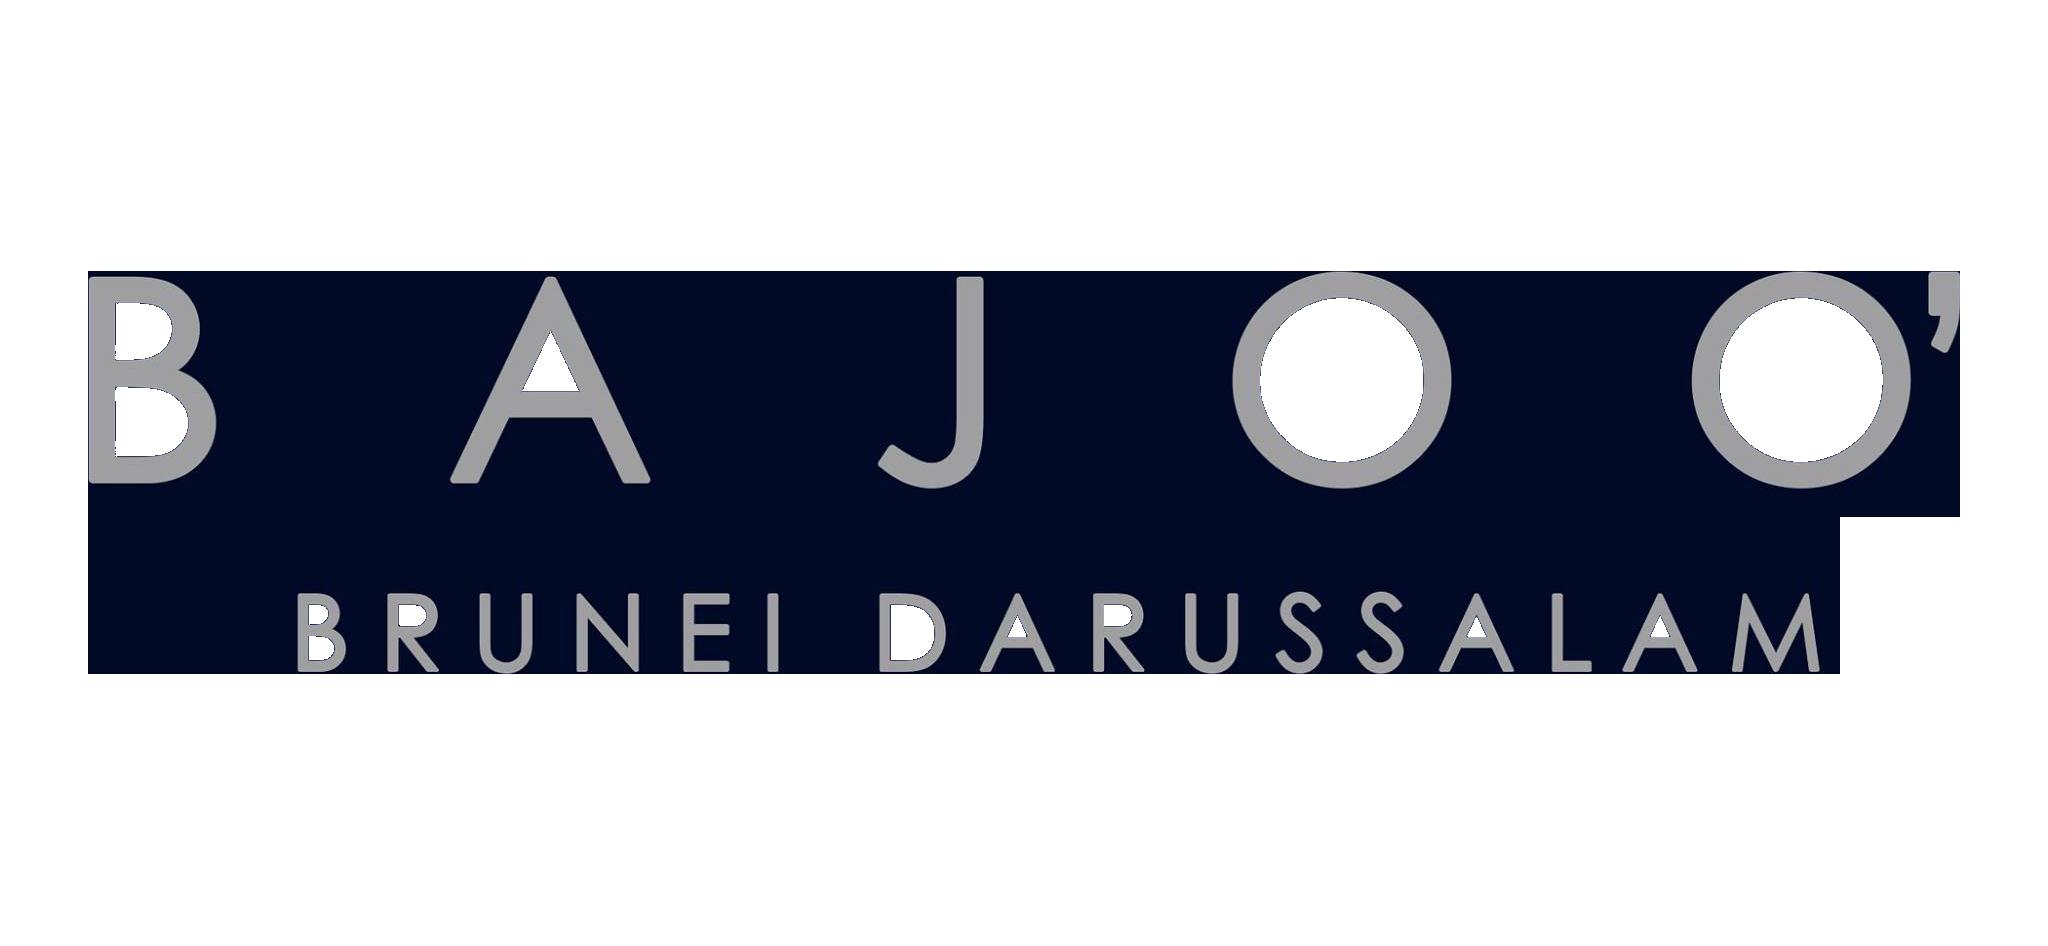 Bajoo Boutique' Brunei Darussalam